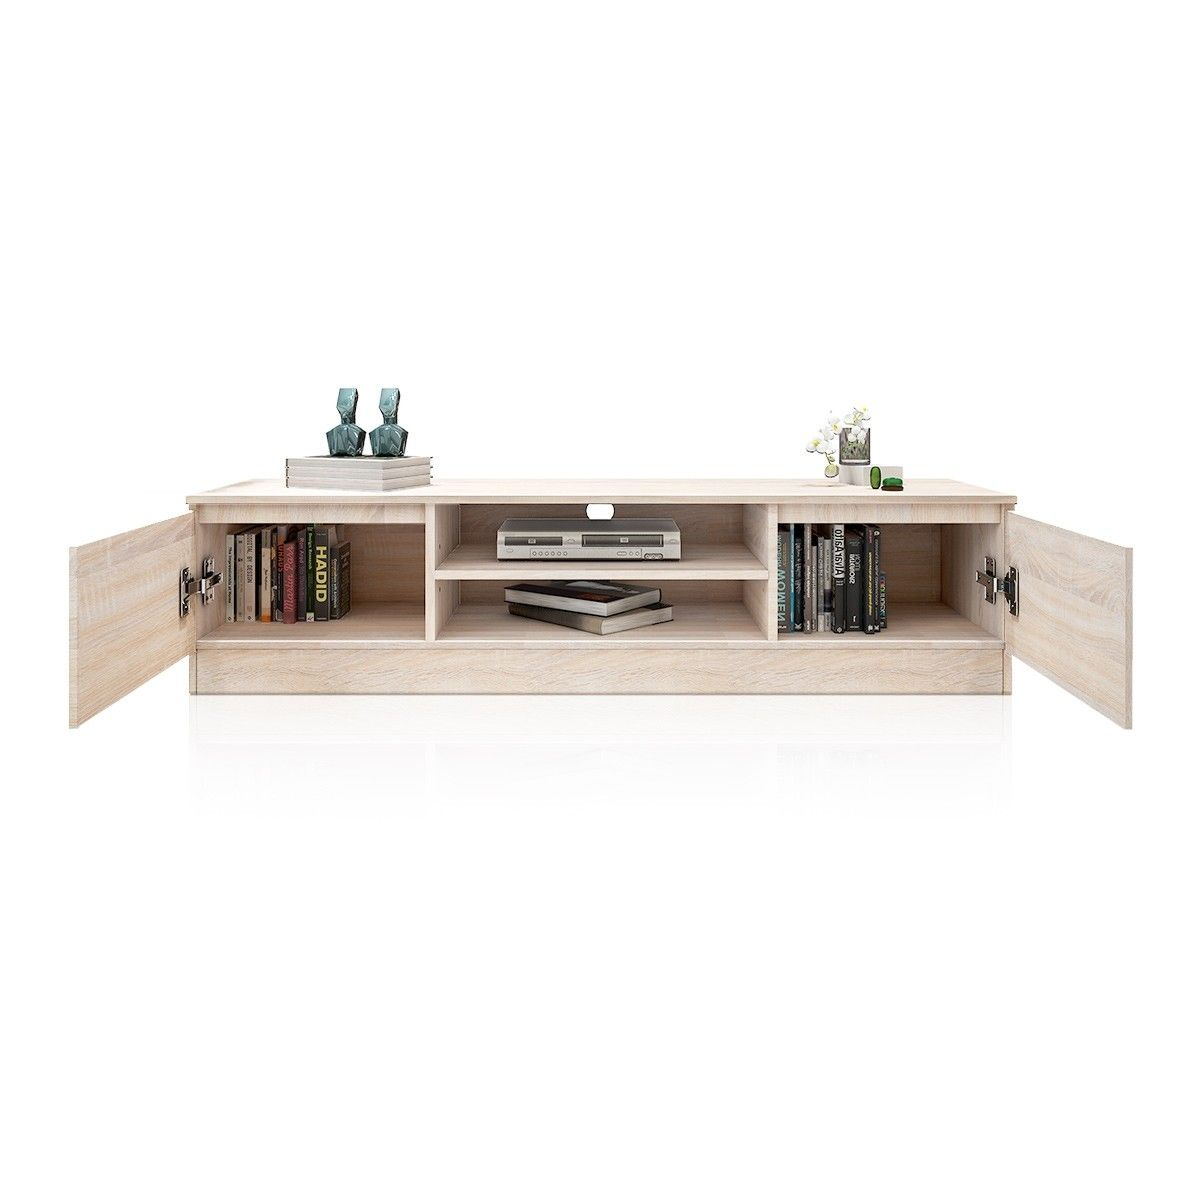 Wooden Storage Cabinet TV Stand With 2 Doors - Oak